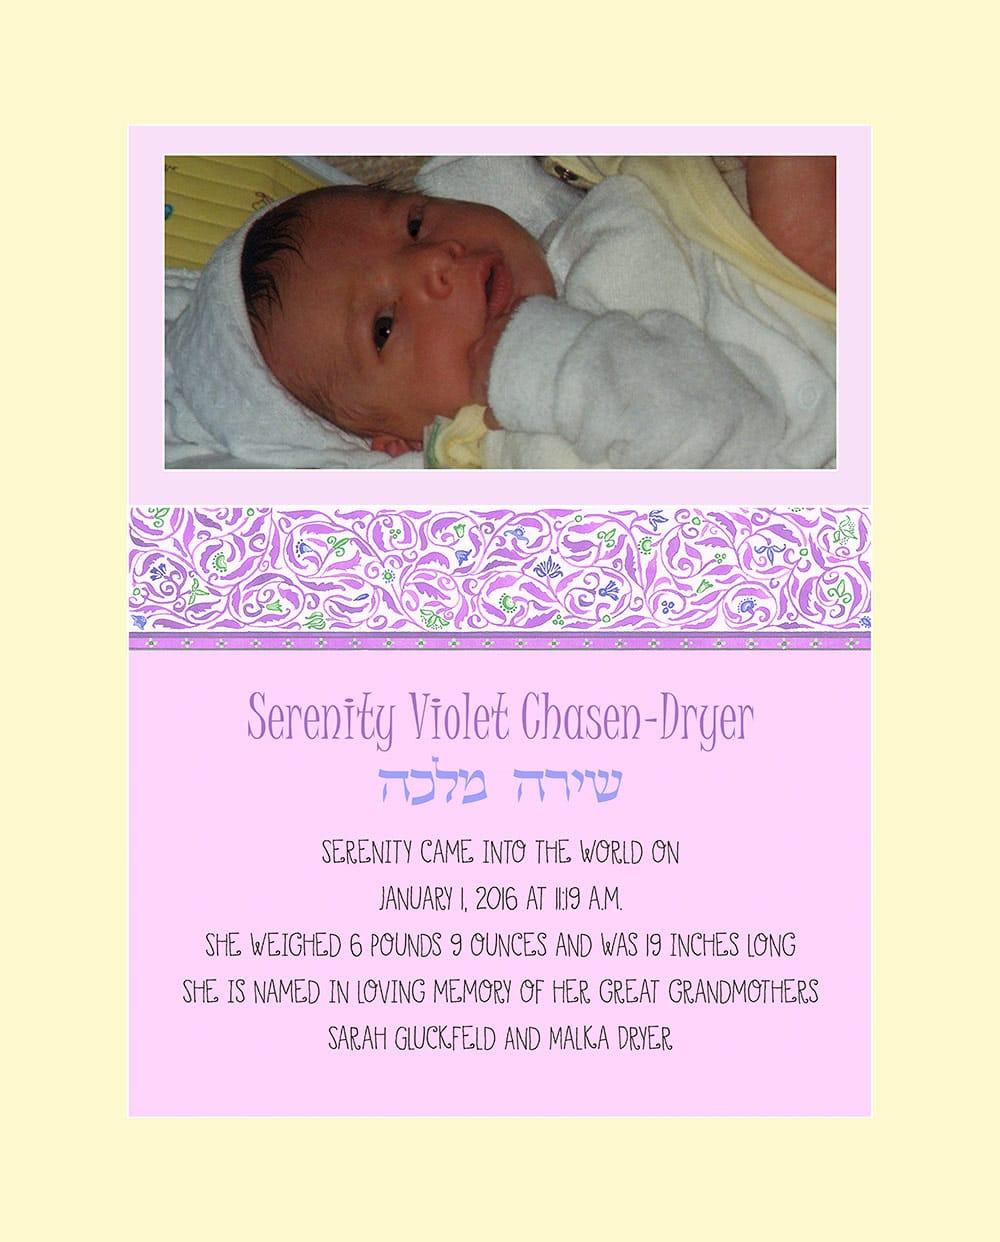 Baby Girl Cutie Pie Pink Baby Wall Art G-BG-15b by Mickie Caspi